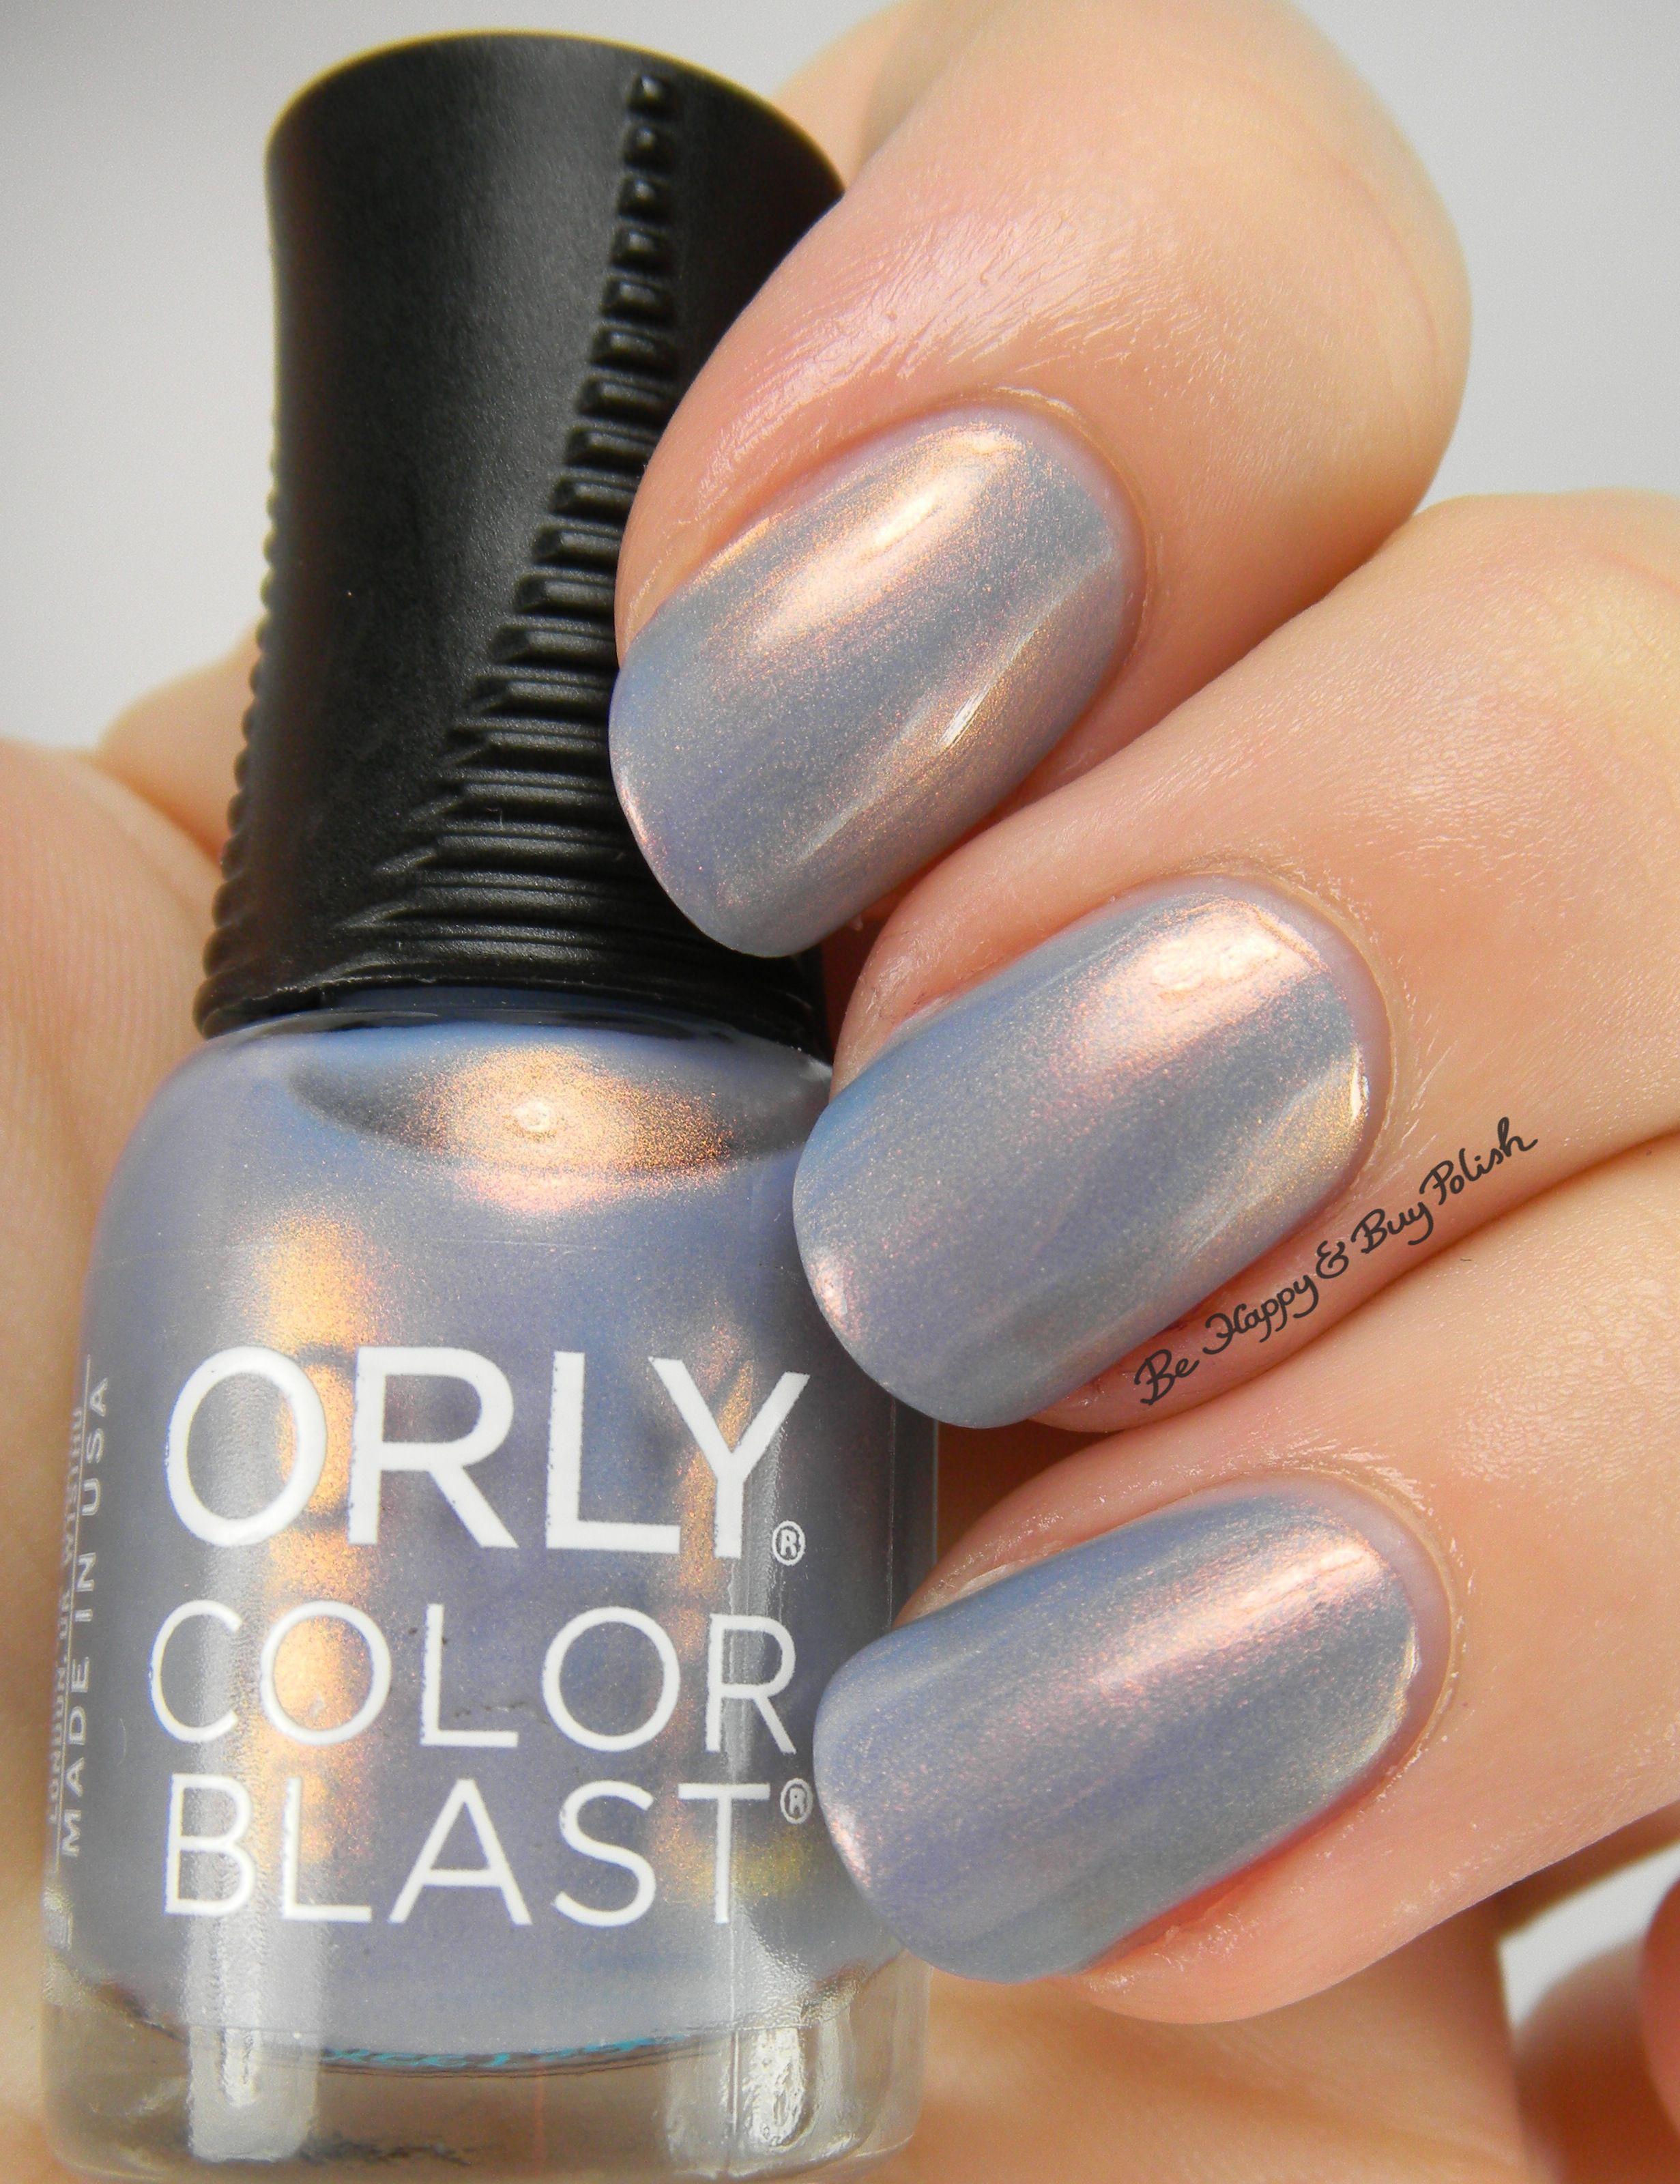 orly color blast cinderella nail